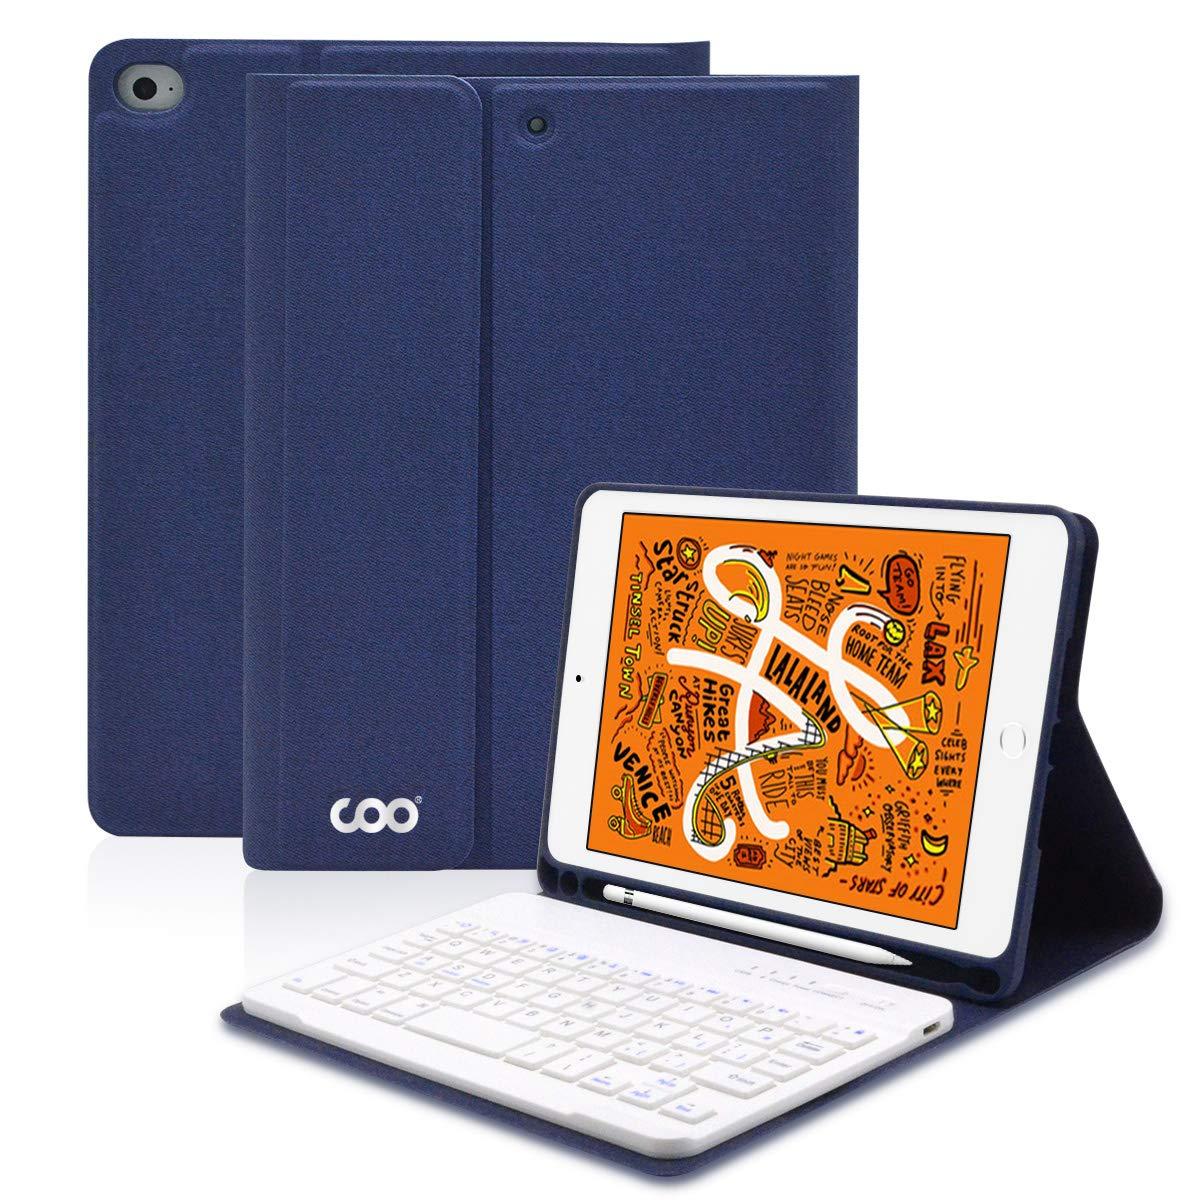 iPad Keyboard Case Mini 5/4 for 5th Generation 2019 Release - Wireless Bluetooth Detachable Keyboard - Auto Sleep/Wake Lightweight Stand Case (Dark Blue)